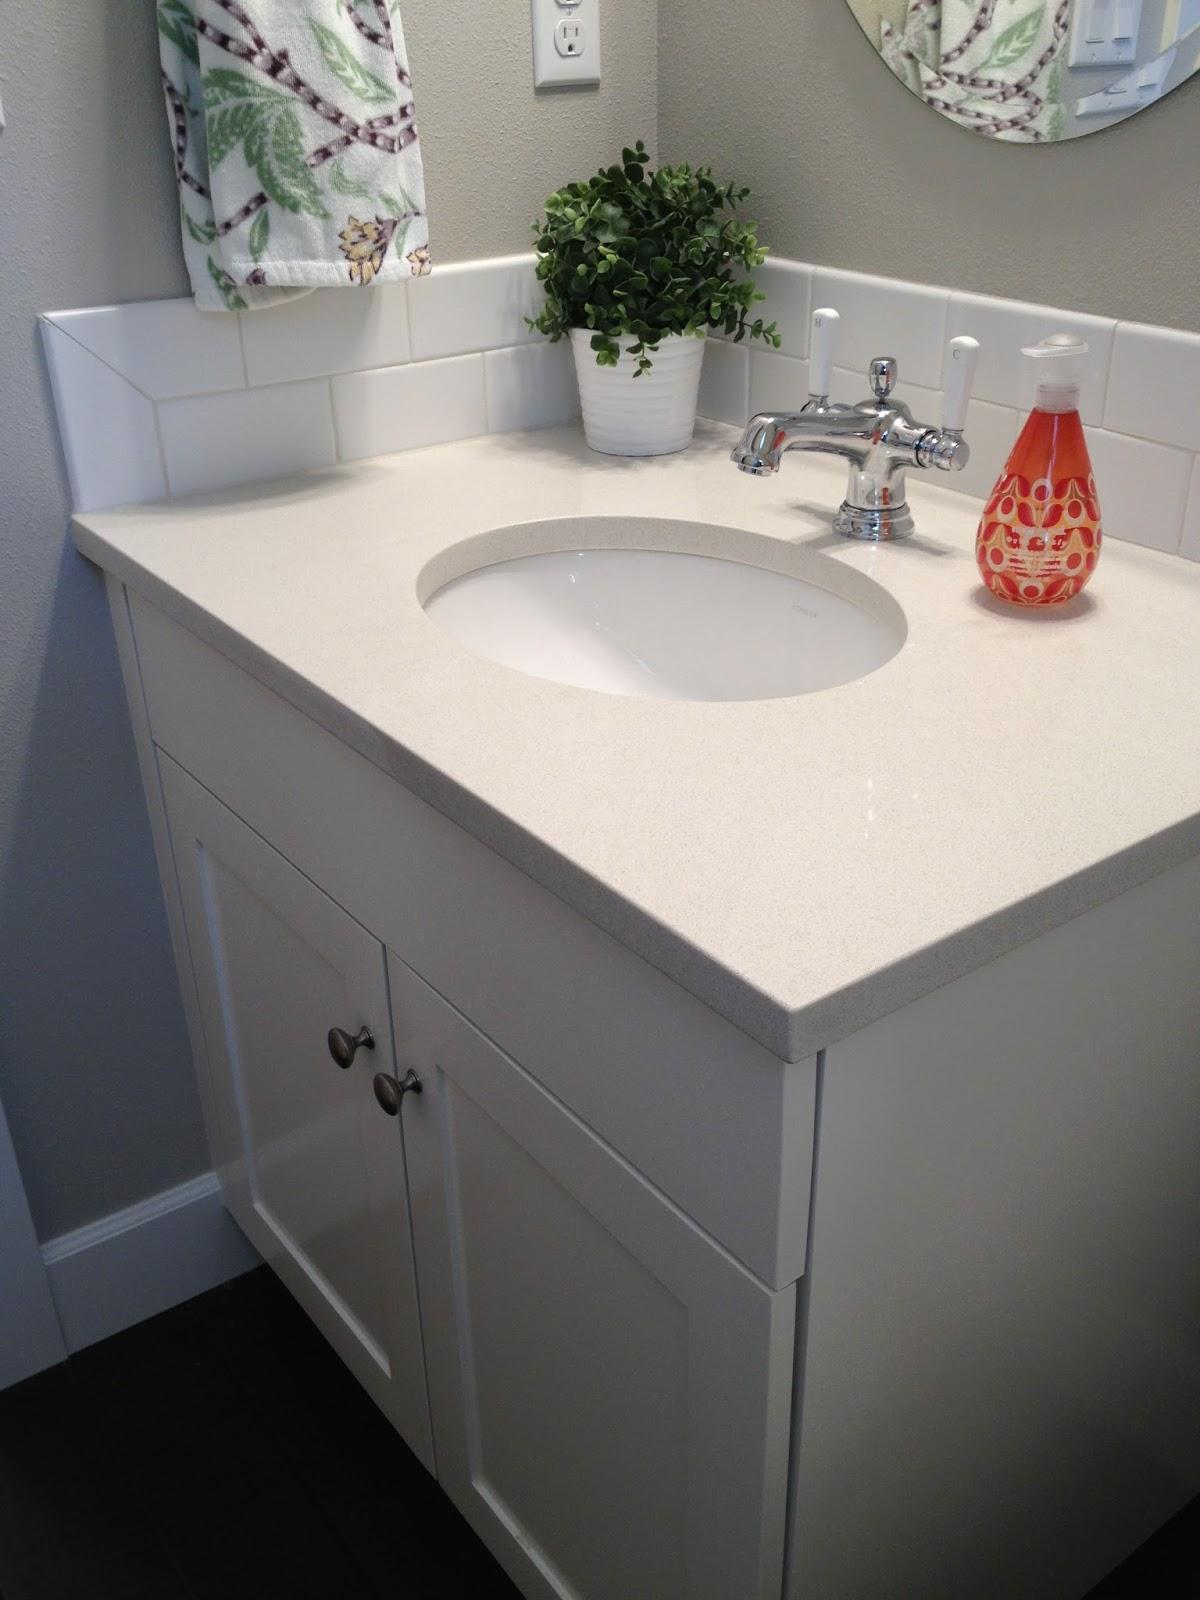 Kohler Bathroom Faucets. 28 Used Kitchen Sink Used Free Standing ...